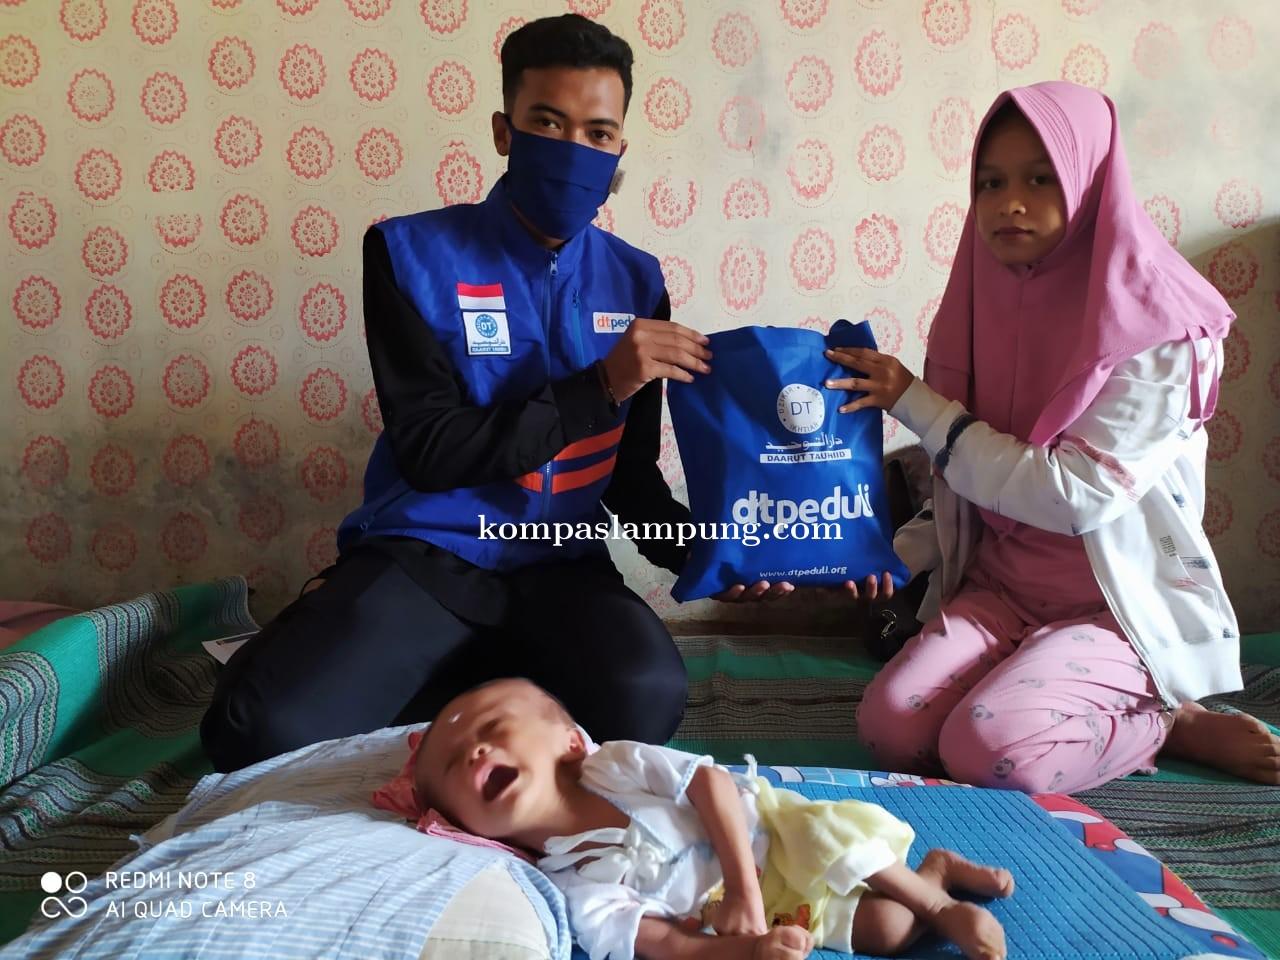 DT Peduli Lampung Bantu Pengobatan Ananda Rayan Nurrahim